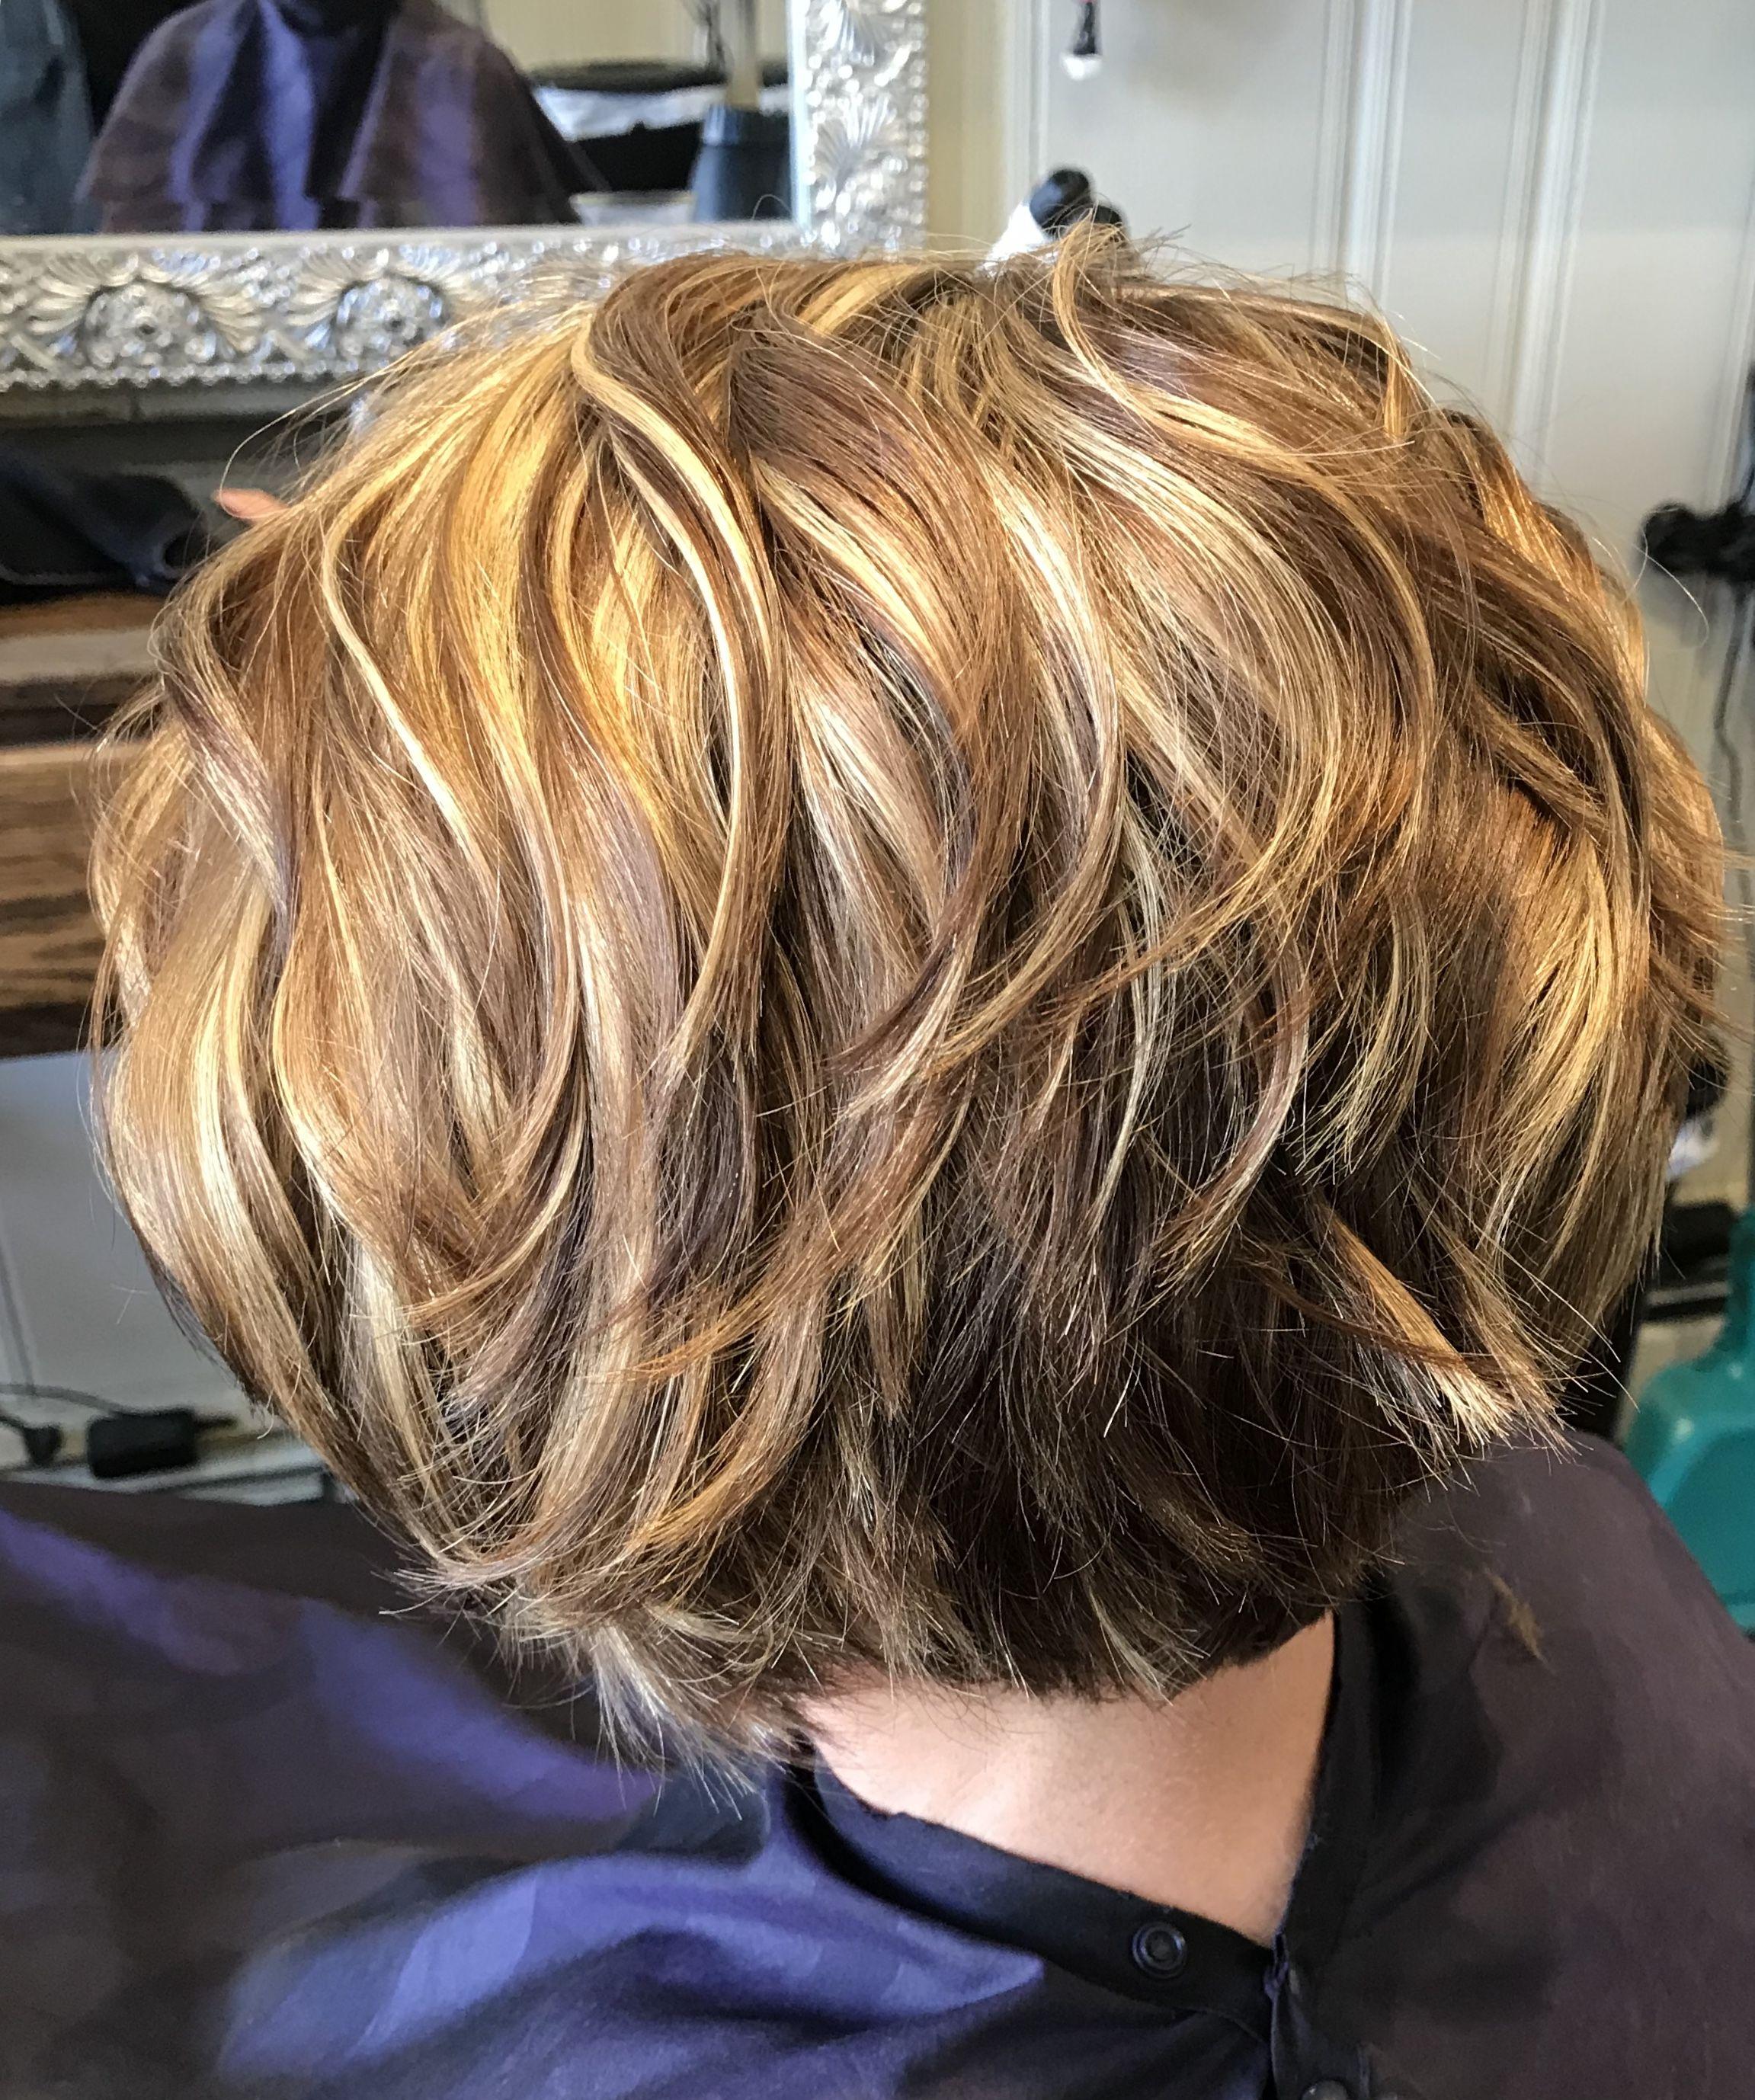 Blonde And Caramel Highlights On A Short Choppy Bob Haircut Choppy Bob Haircuts Easy Dinner Recipes Easy Beef